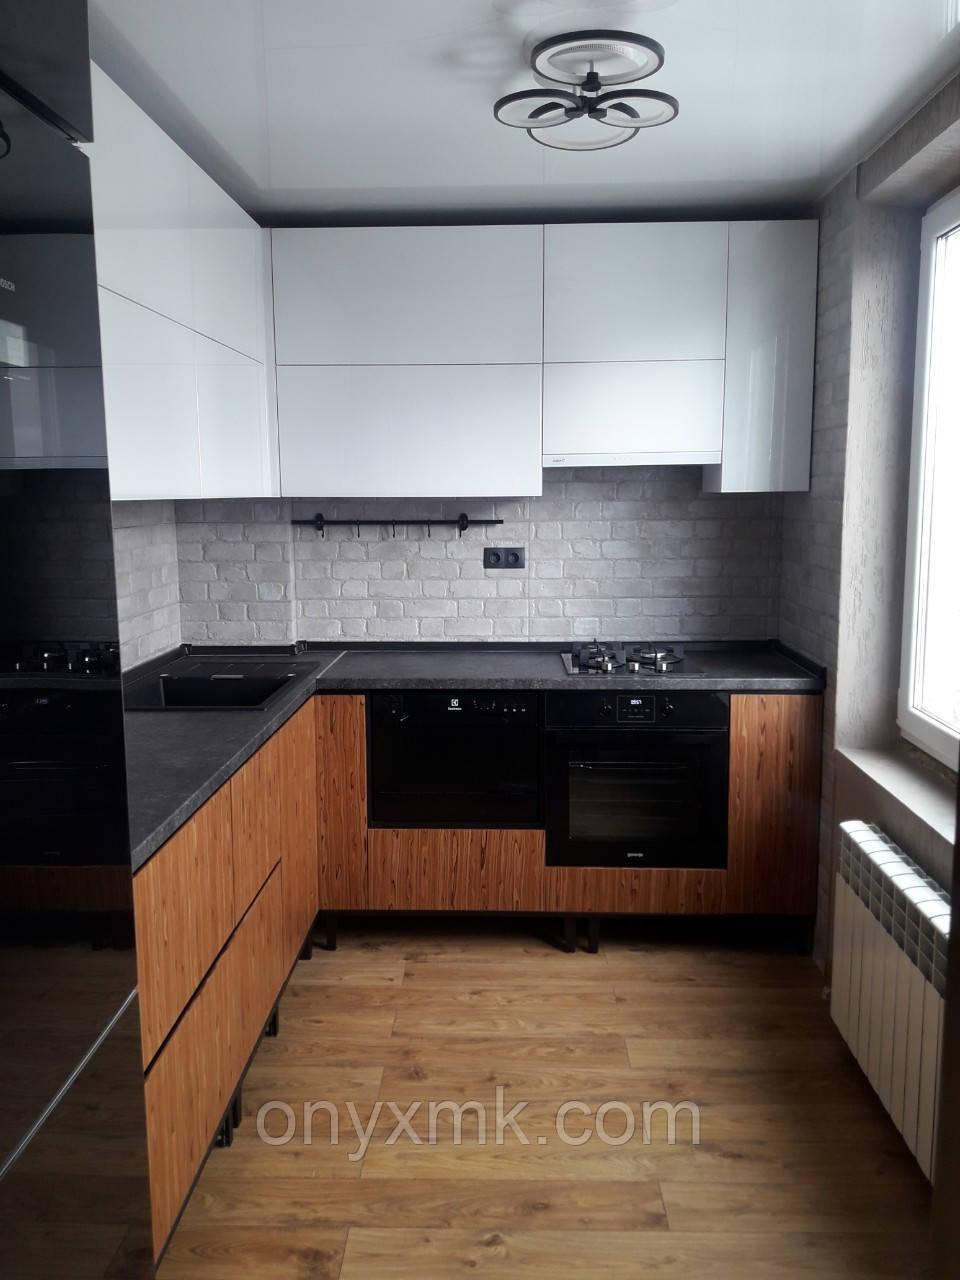 Угловая кухня на металлическом каркасе